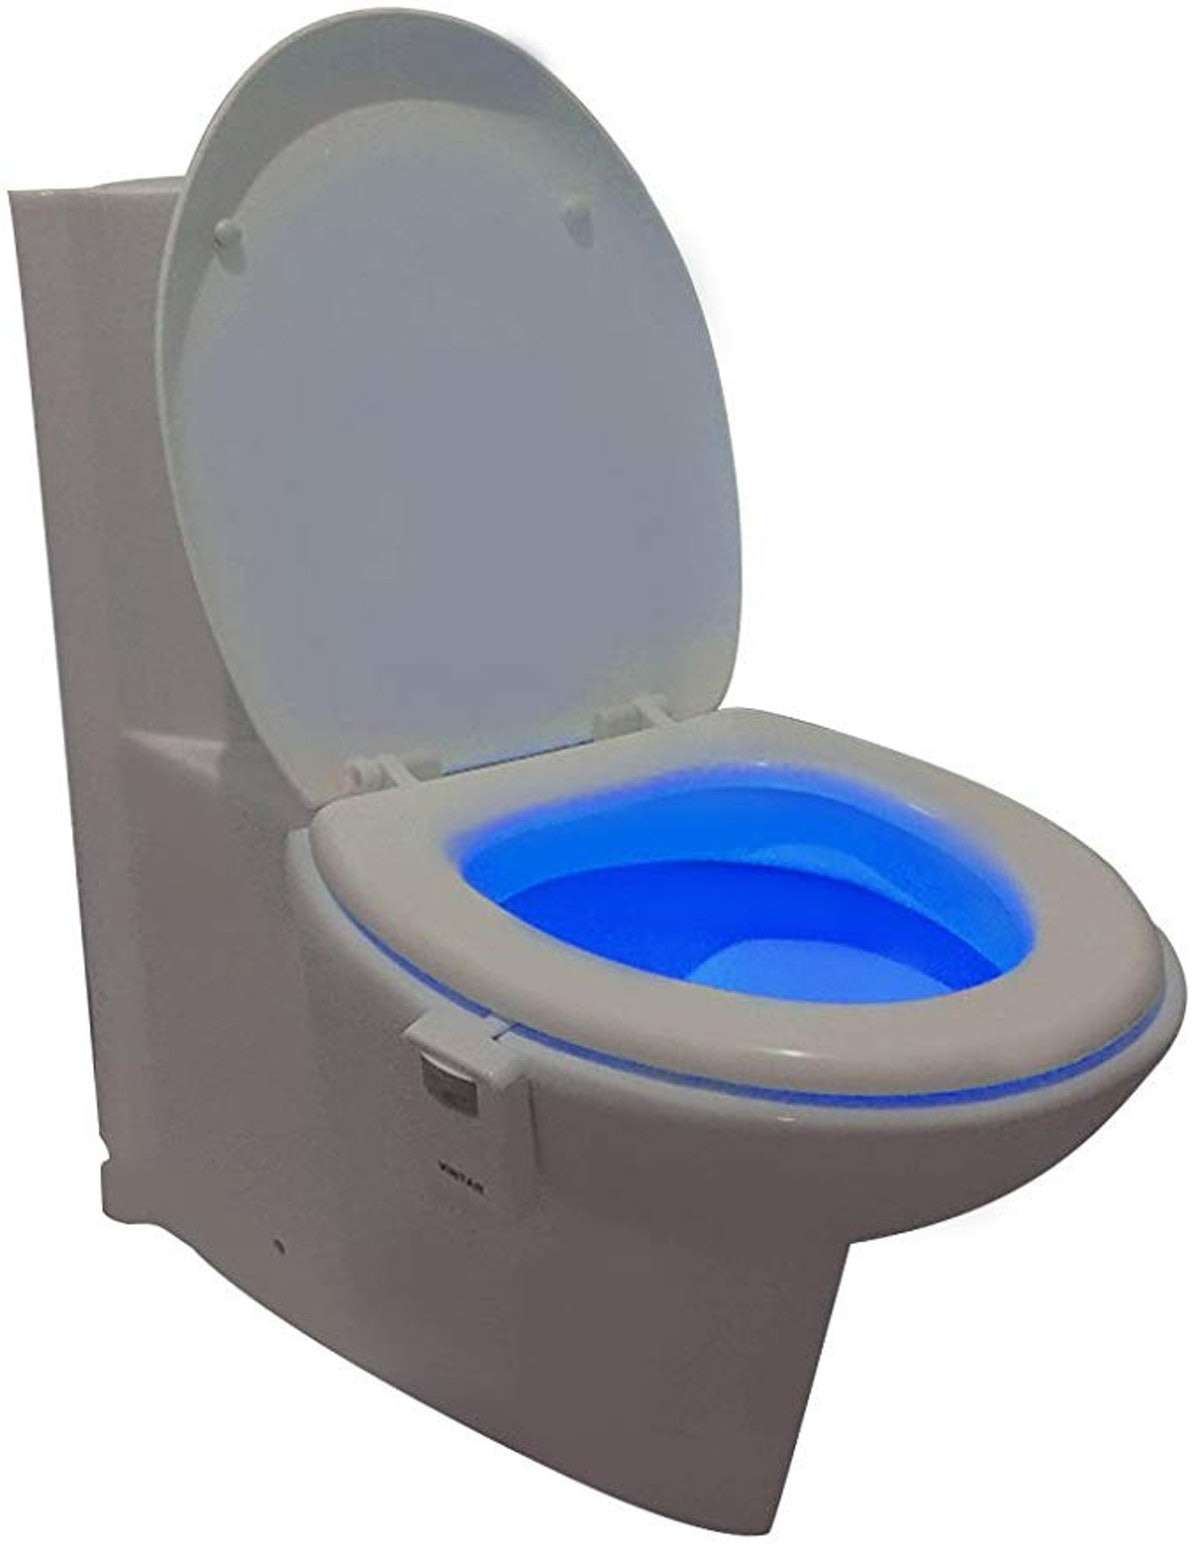 Vintar 16-Color Motion Sensor LED Toilet Night Light